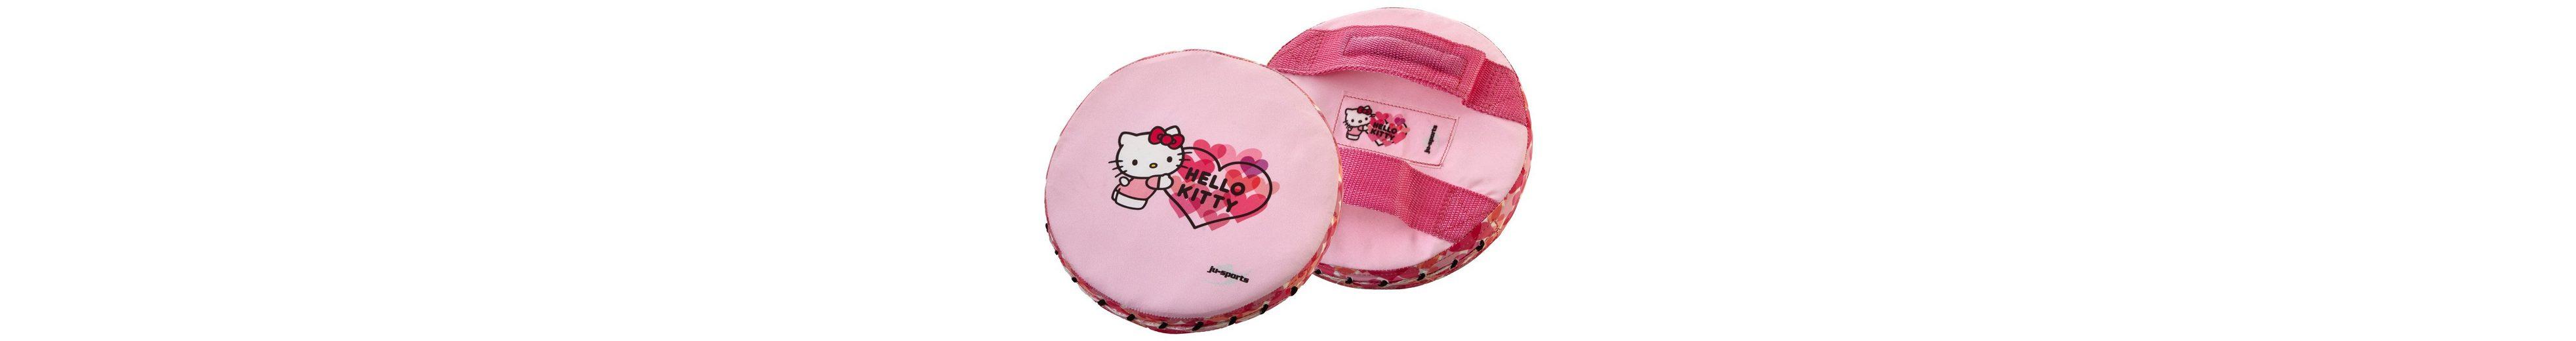 Ju-Sports Kinder Rundpratze, »Hello Kitty Free Hugs«